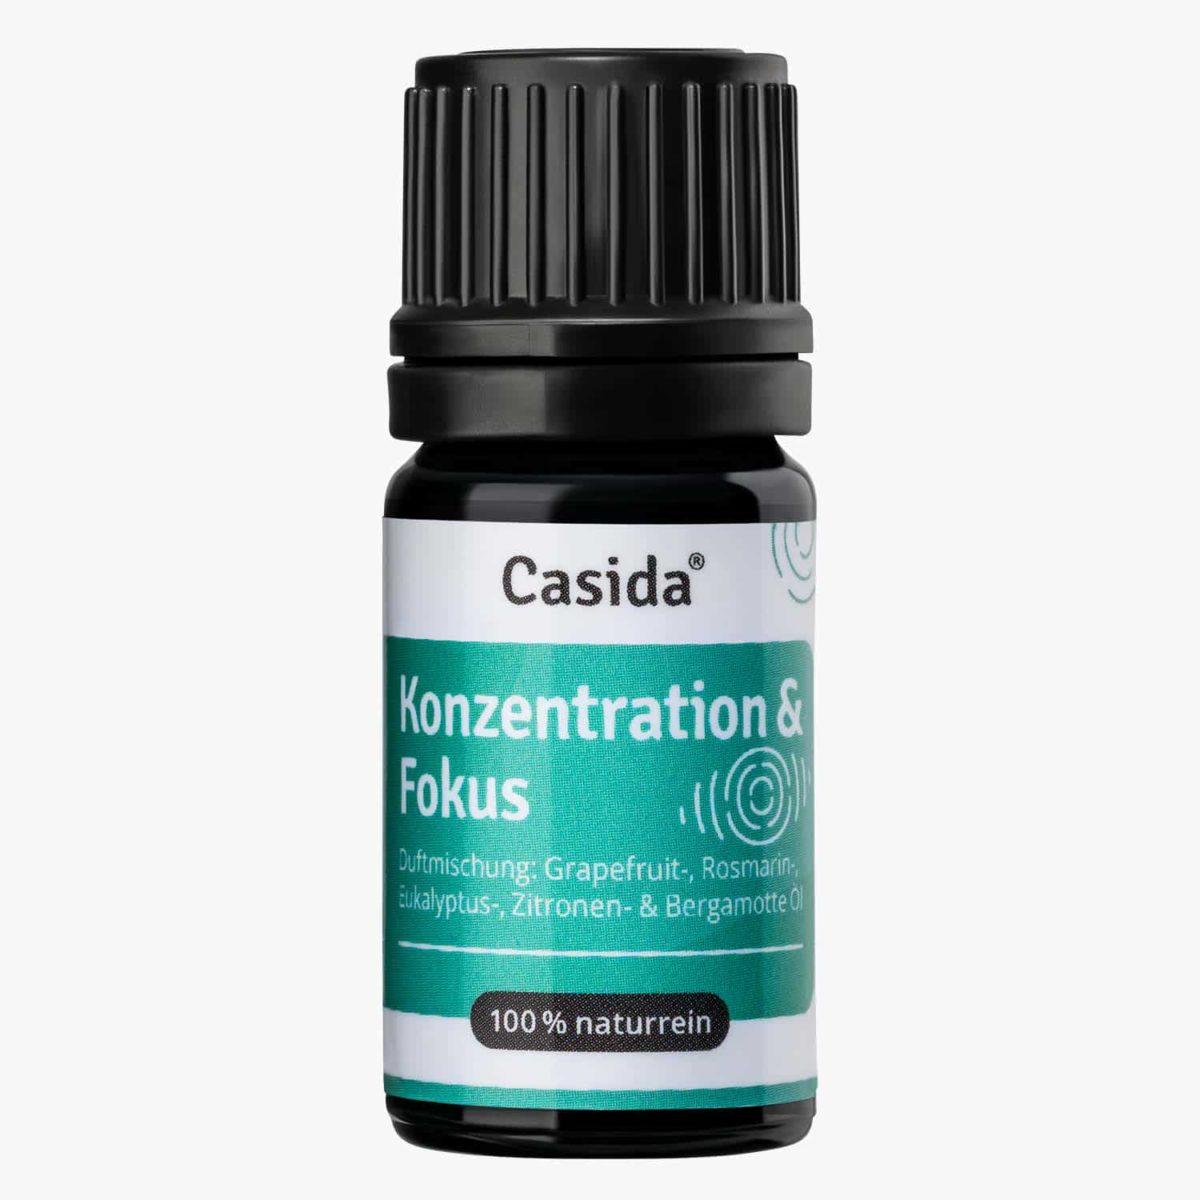 Casida Focusing Aroma-Blend Konzentration & Fokus - 5 ml 17377200 PZN Apotheke Energie Gedächtnis Aromatherapie Aromapflege Aromaschmuck Diffuser